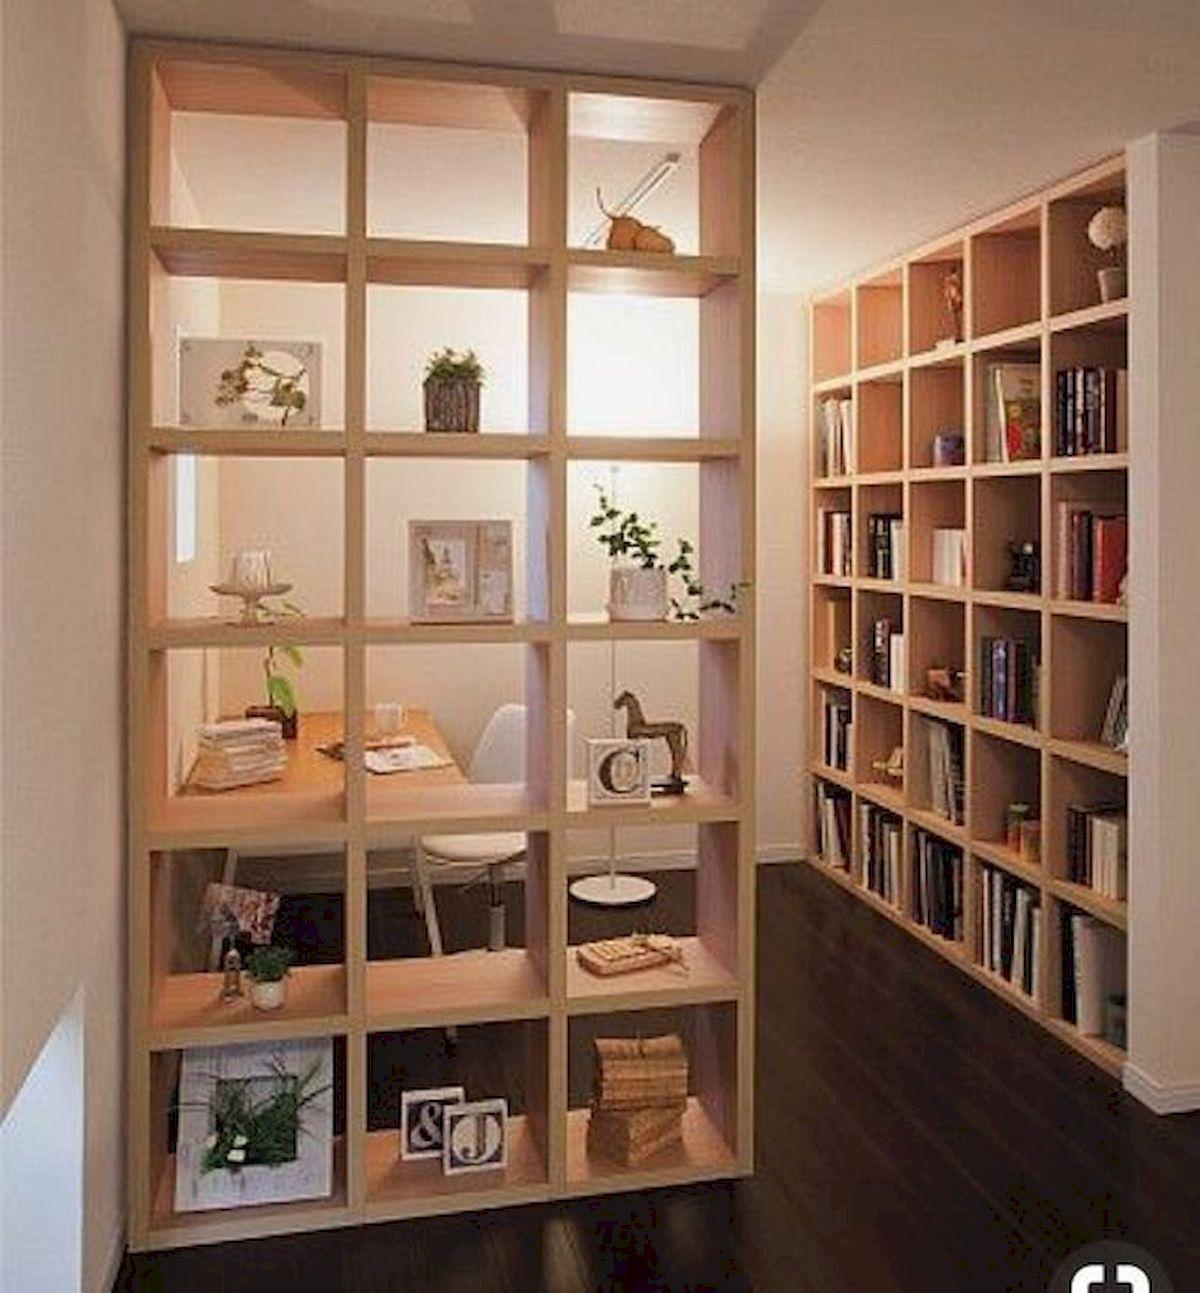 60+ Favorite Studio Apartment Storage Decor Ideas And Remodel images